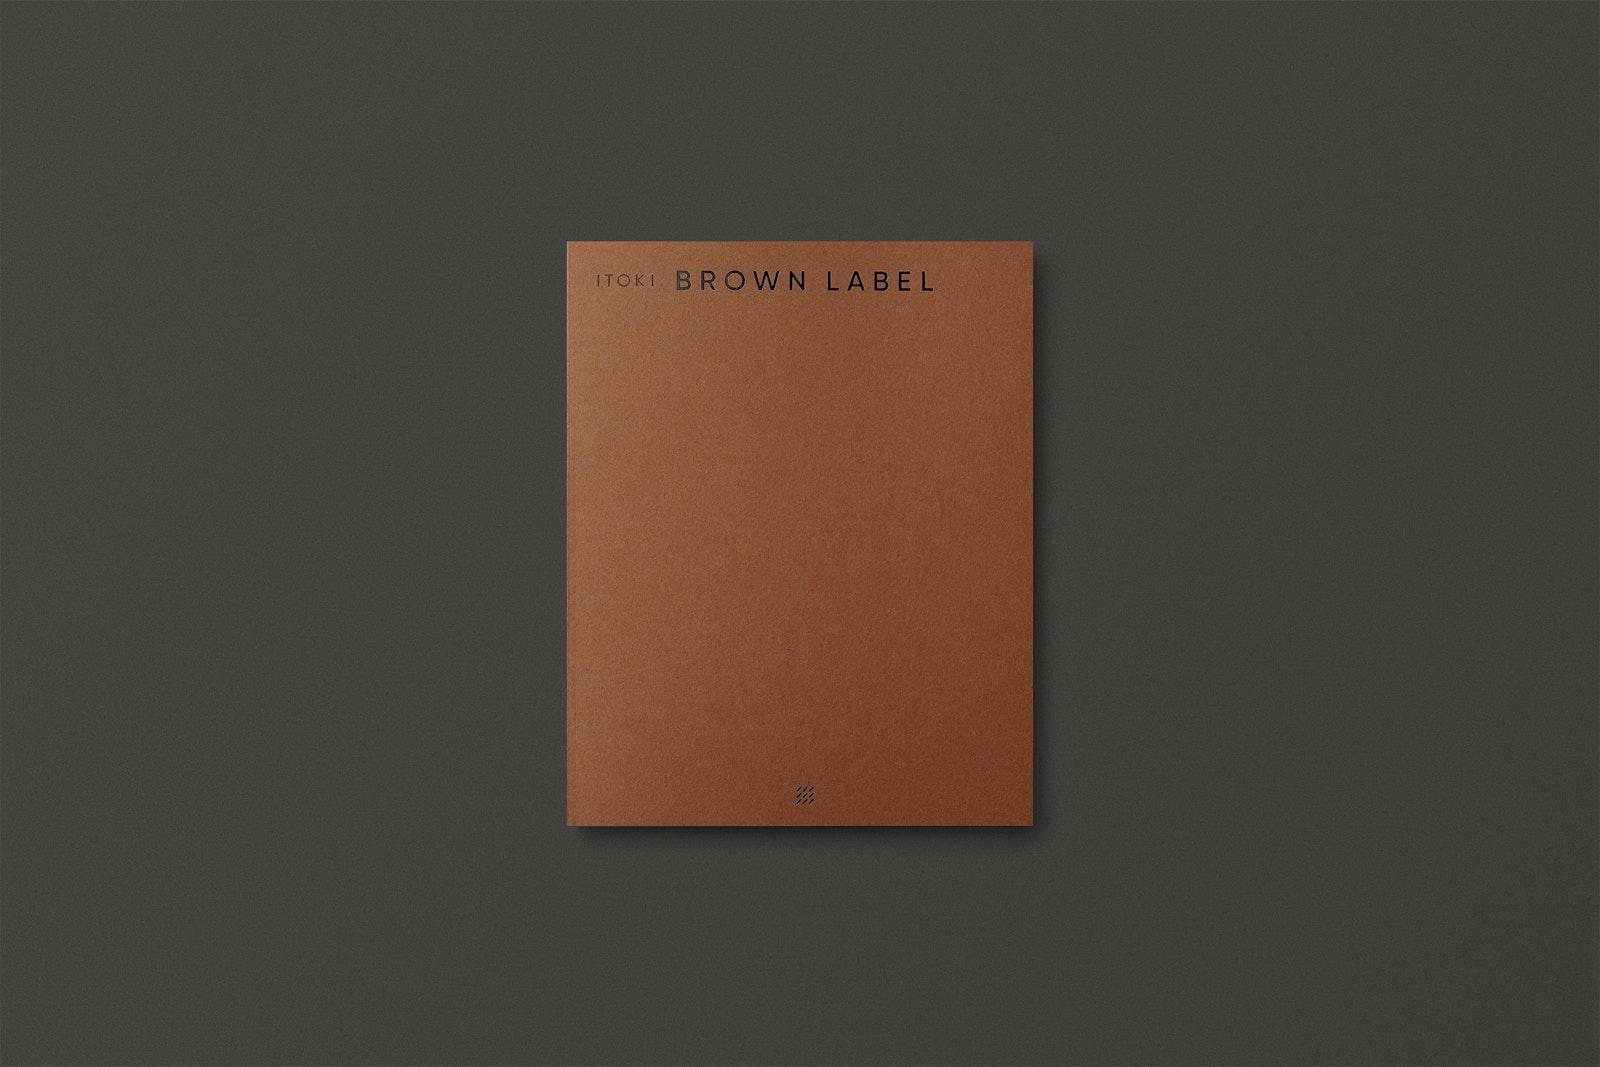 Itoki Brown Label